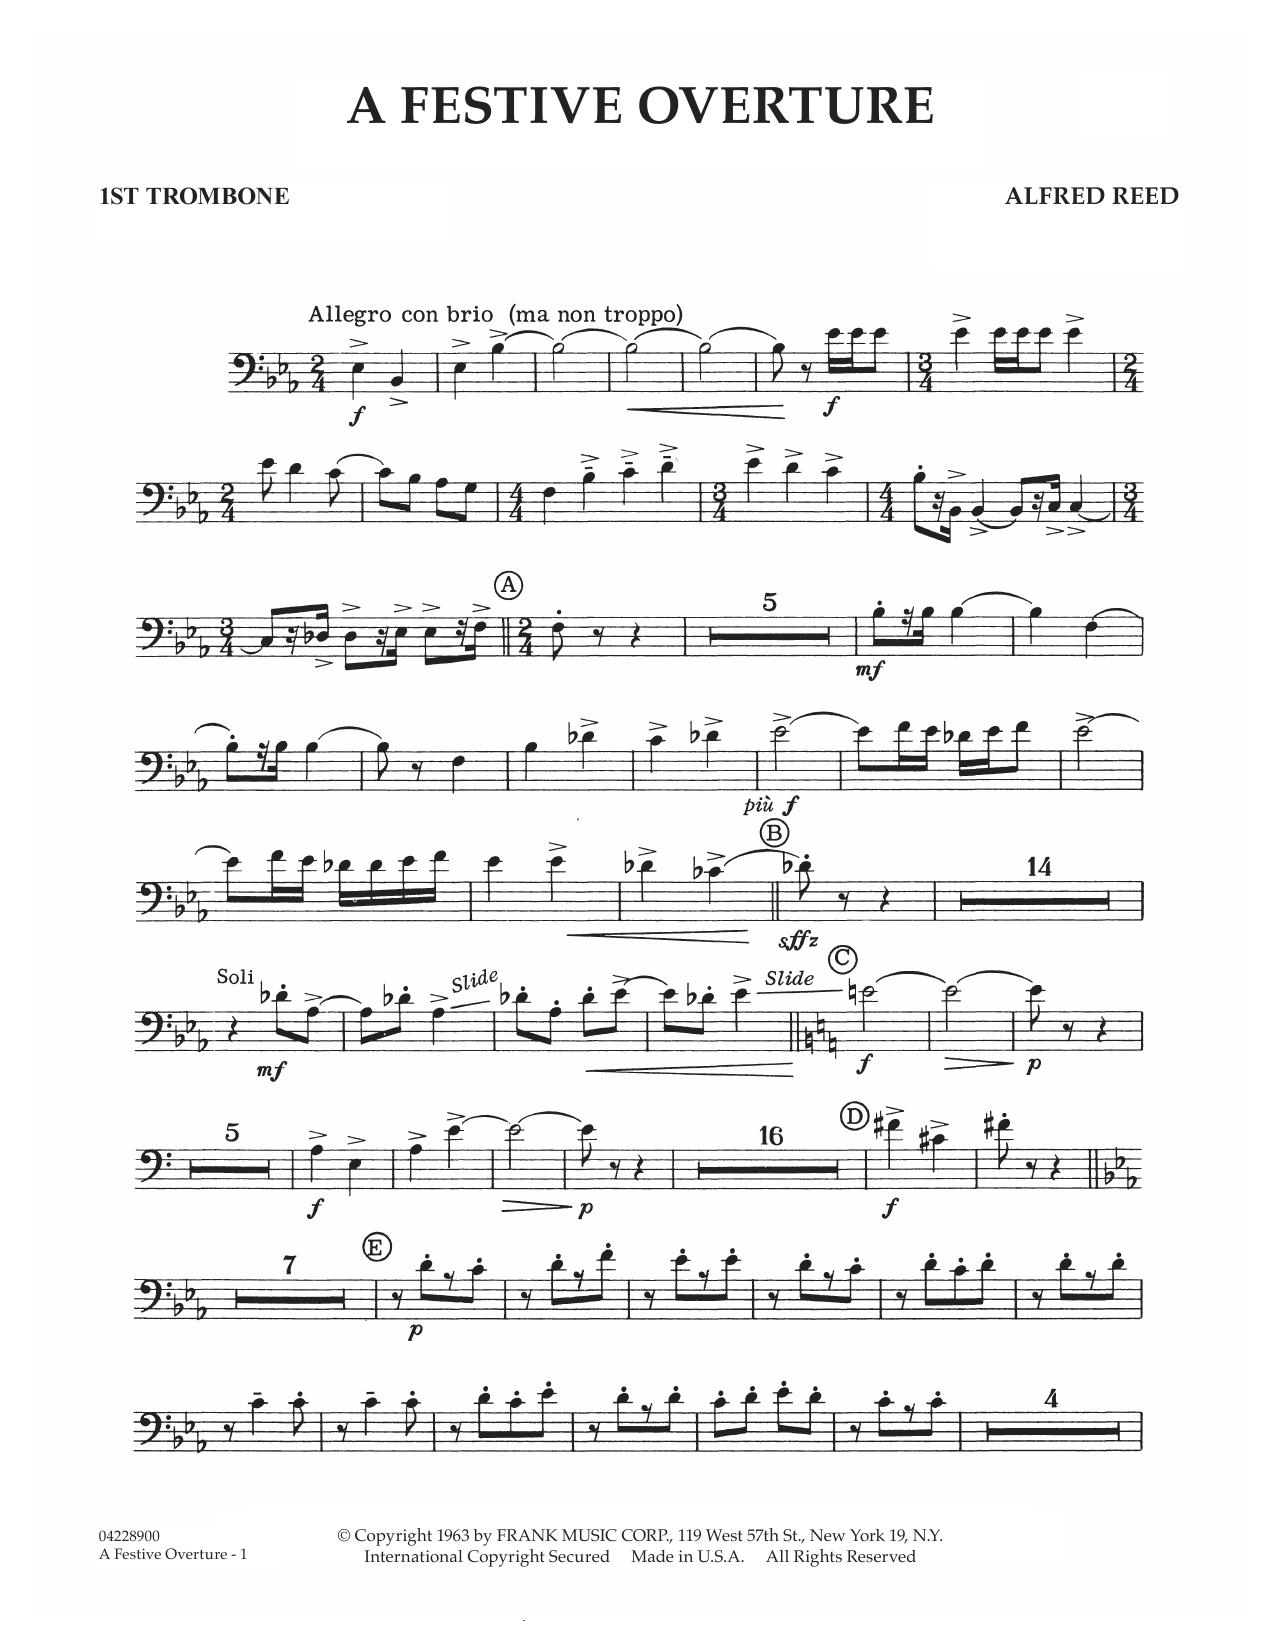 A Festive Overture - 1st Trombone (Concert Band)